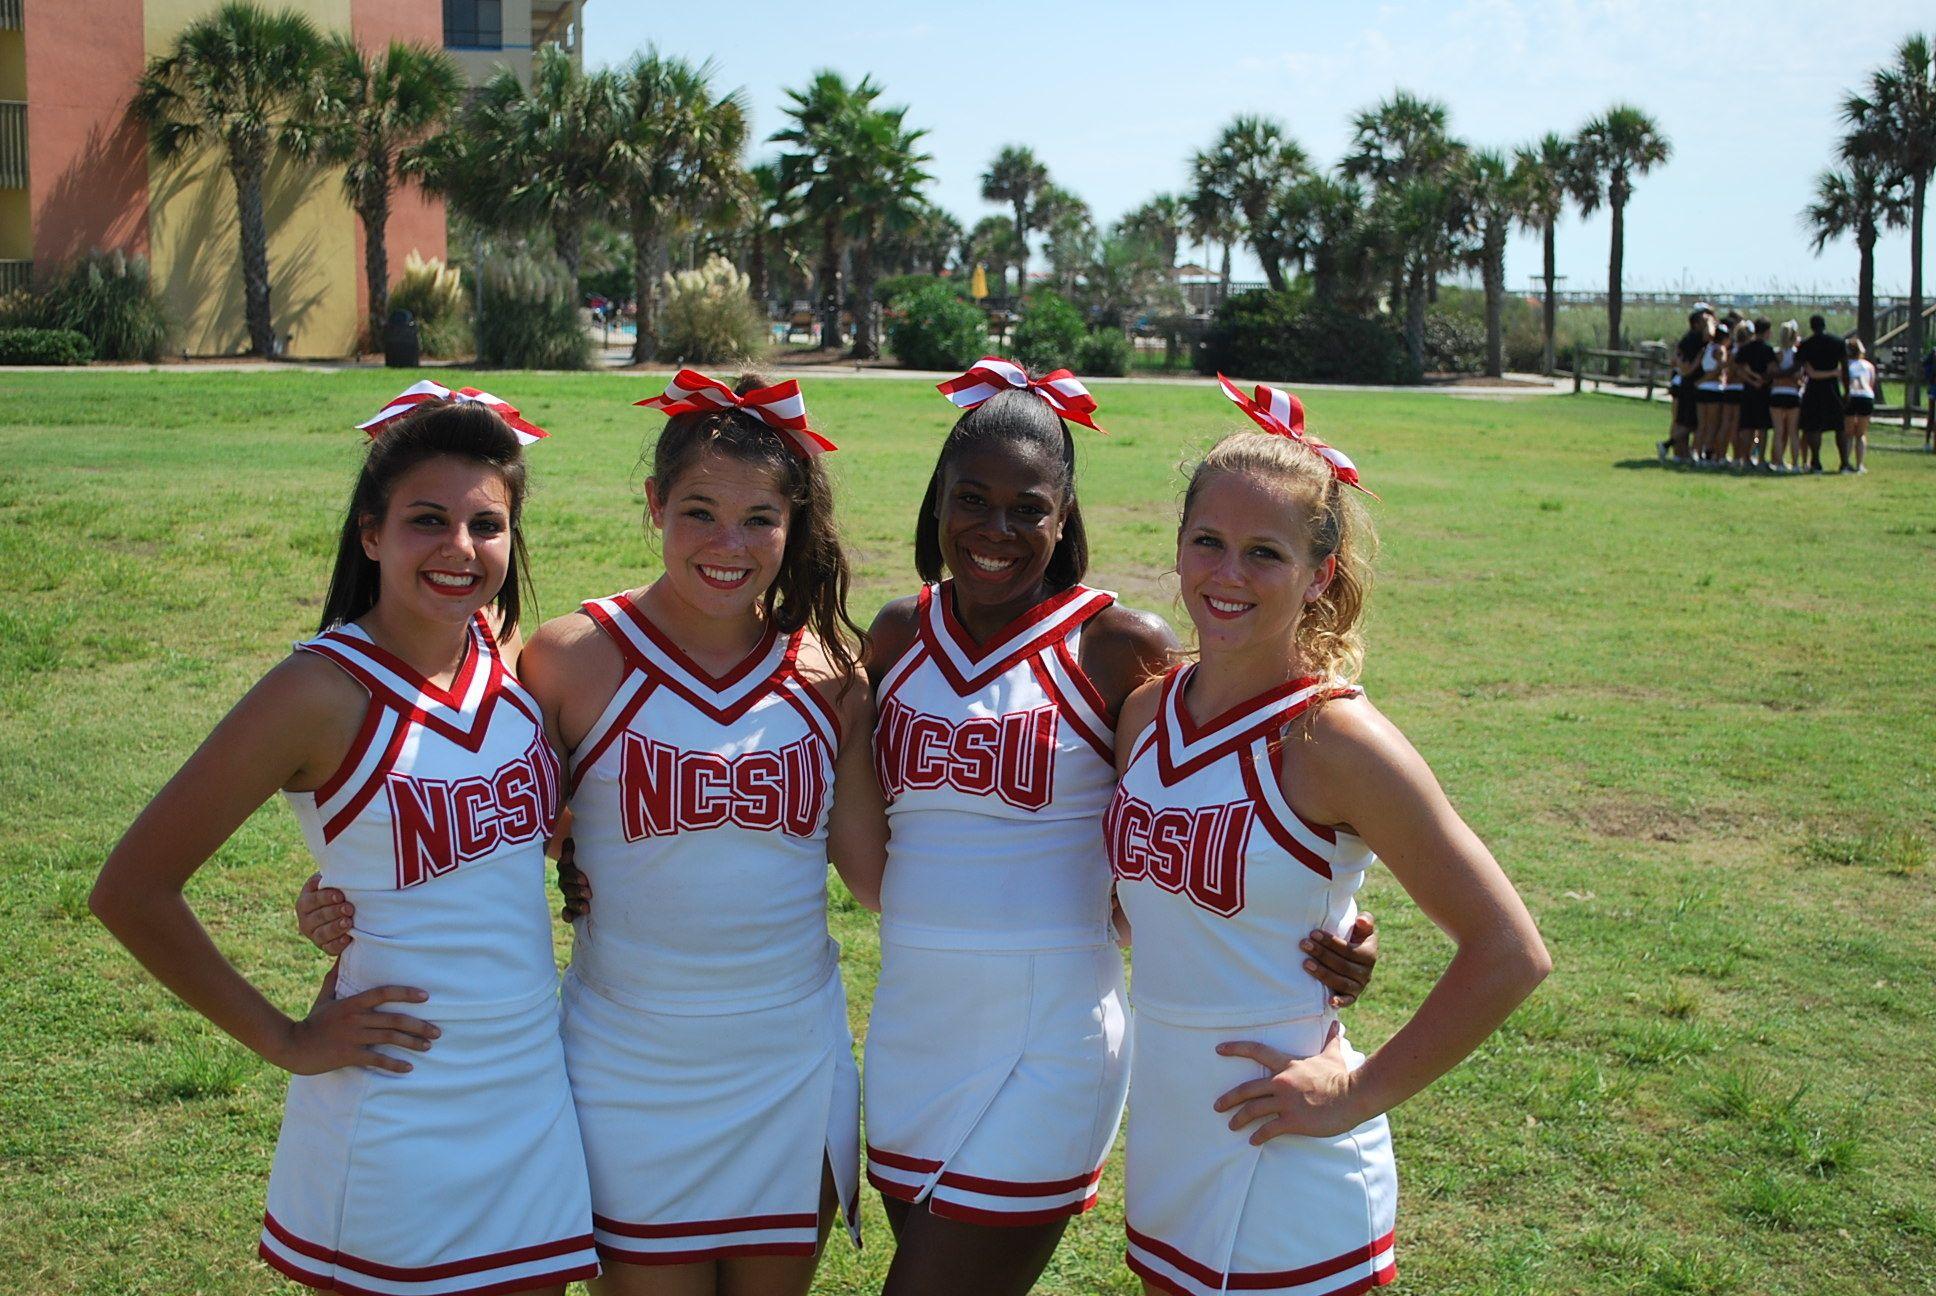 f6ba92441164f NC State Cheerleaders and Mascots Earn Preseason Awards